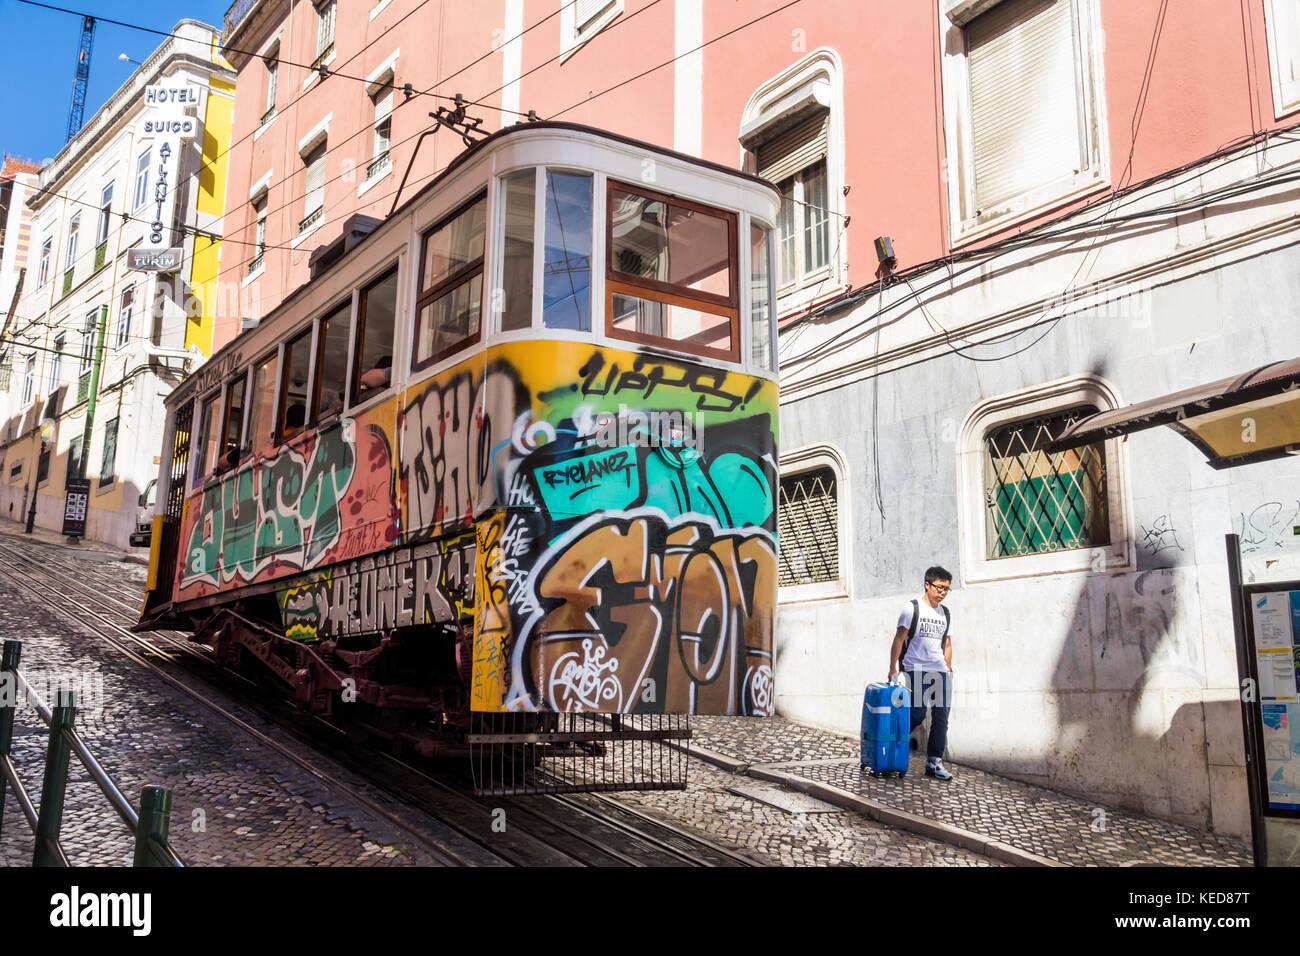 Lisbon Portugal Restauradores Square Ascensor da Gloria Elevador tram funicular railway Asian man luggage suitcase - Stock Image